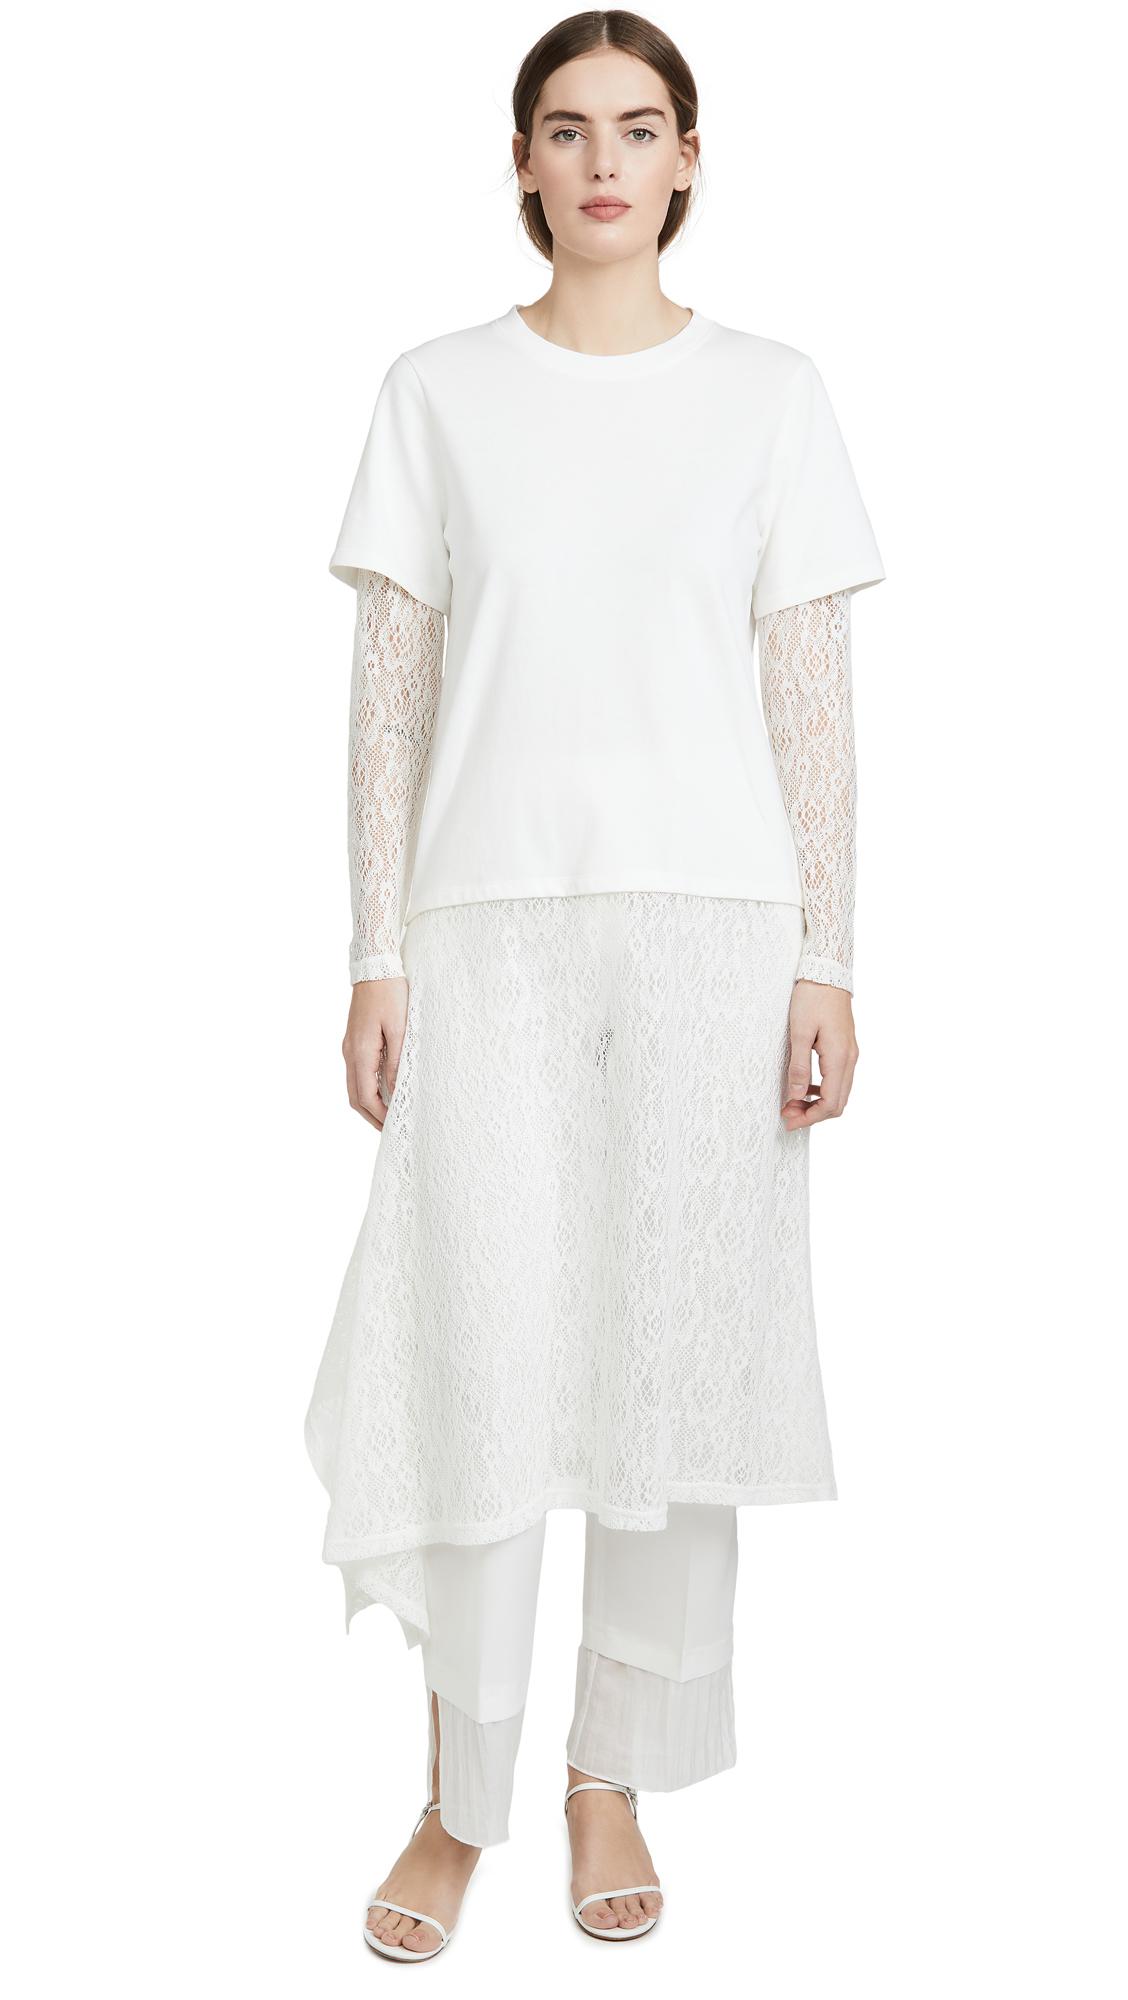 Buy GOEN.J Double Layered Crochet Lace and Cotton Jersey Dress online beautiful GOEN.J Clothing, Dresses